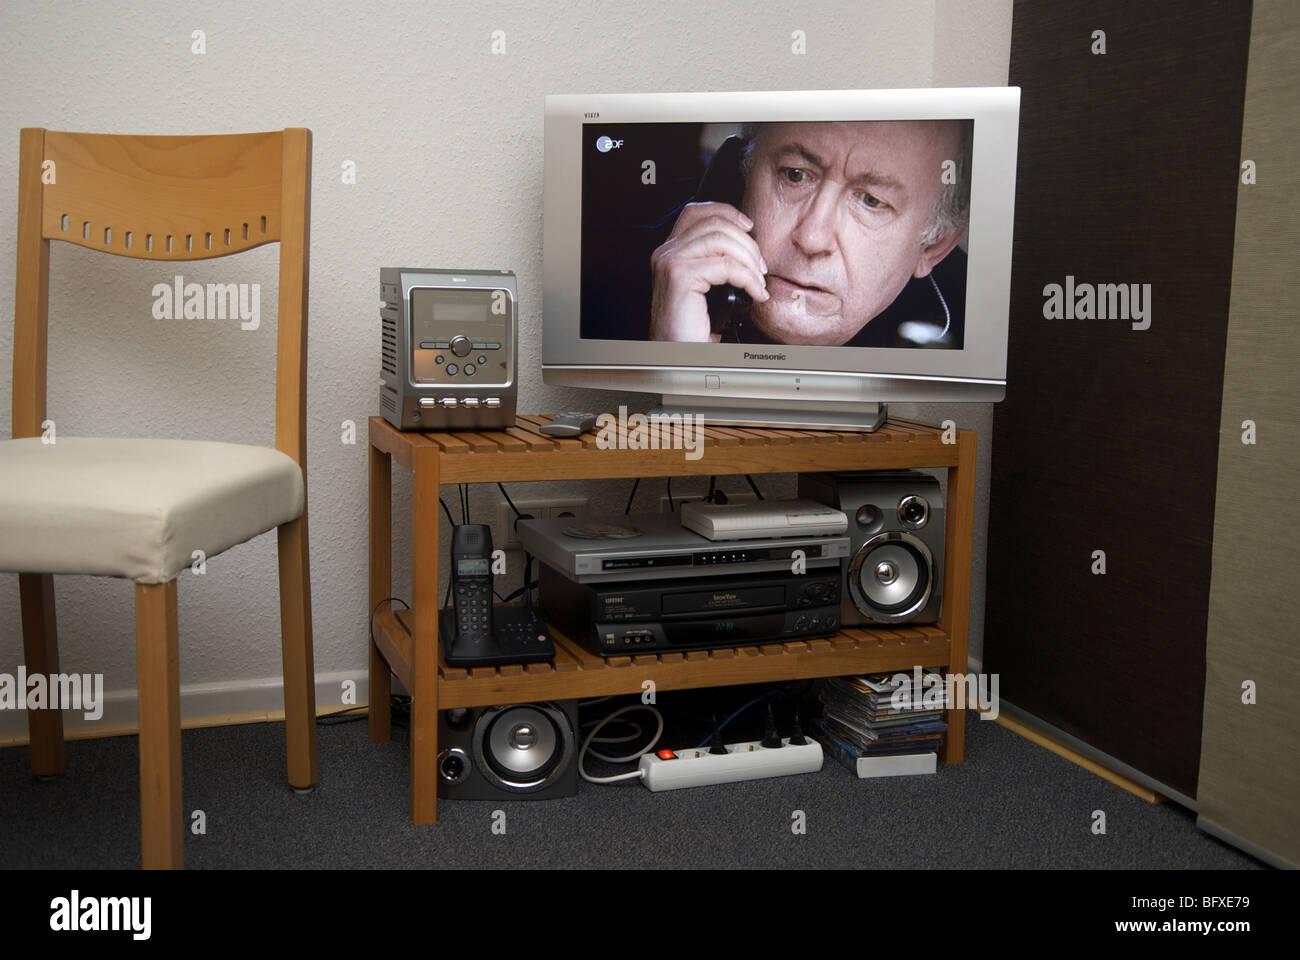 Home appliances Stock Photo